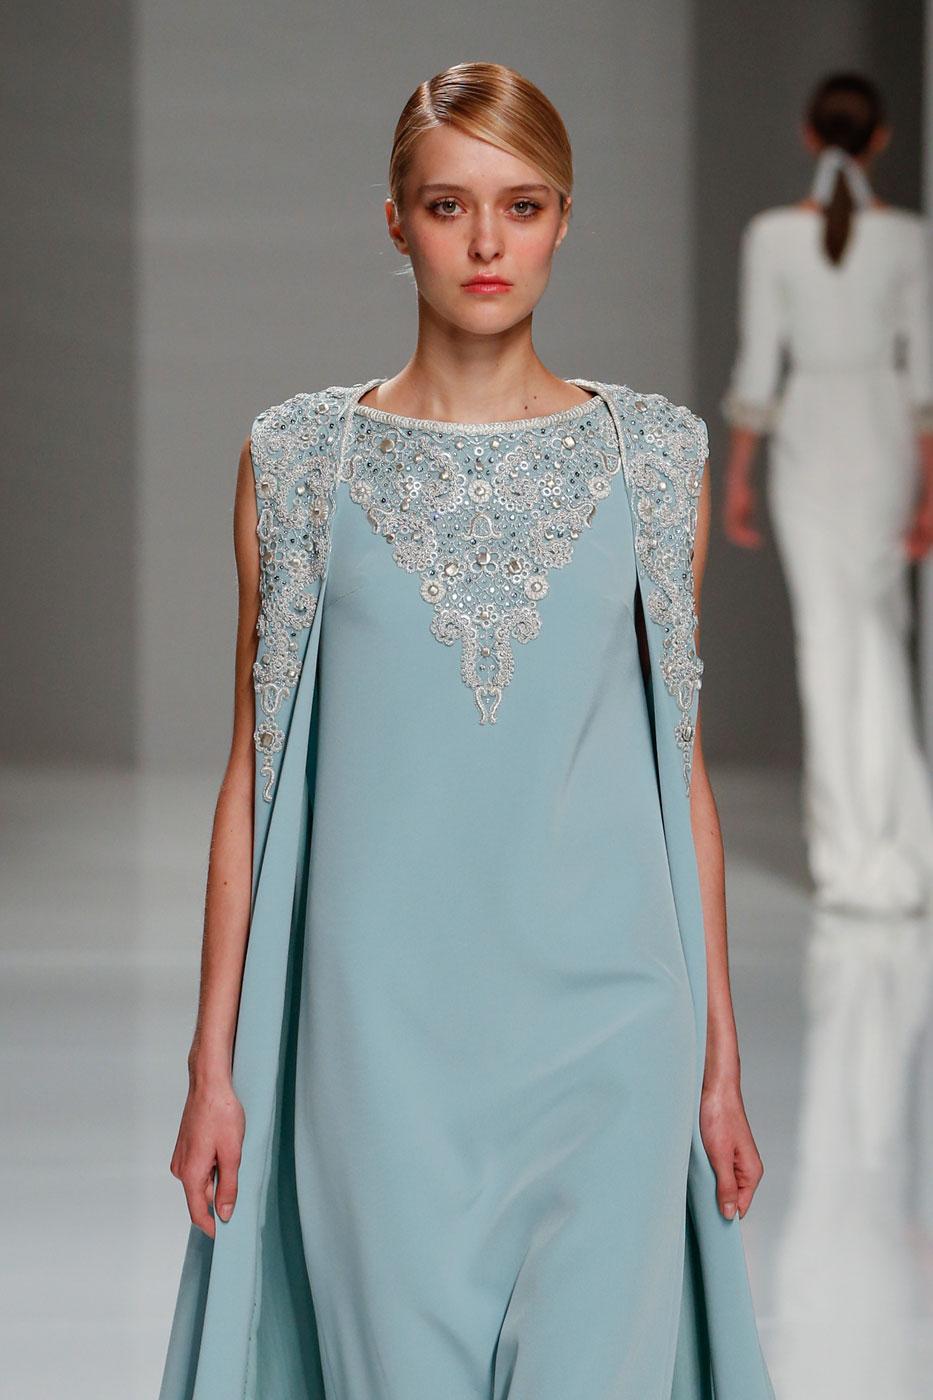 Georges-Hobeika-fashion-runway-show-haute-couture-paris-spring-2015-the-impression-38